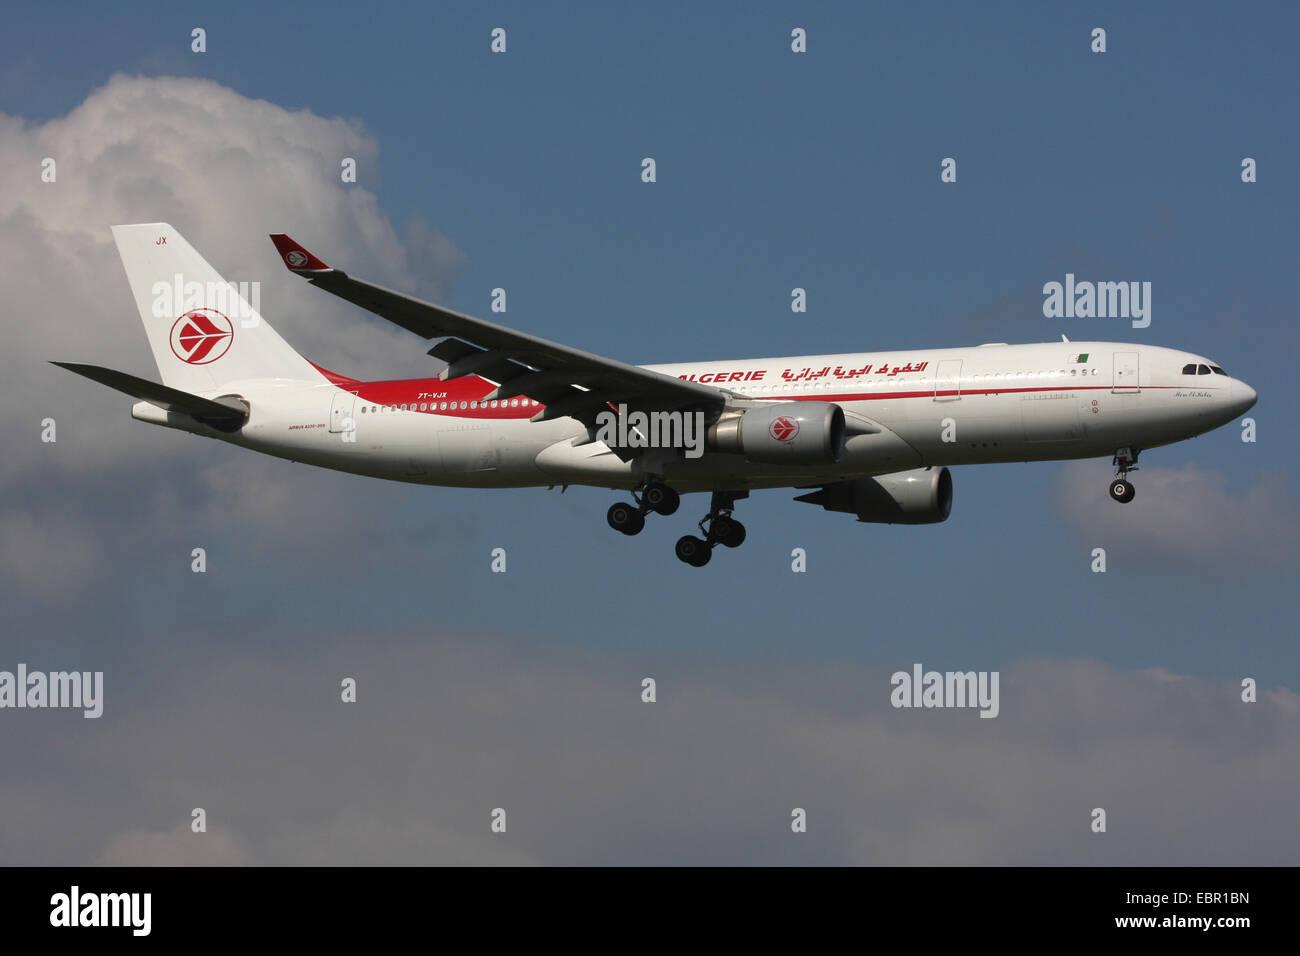 AIR ALGERIE ALGERIA A330 Immagini Stock